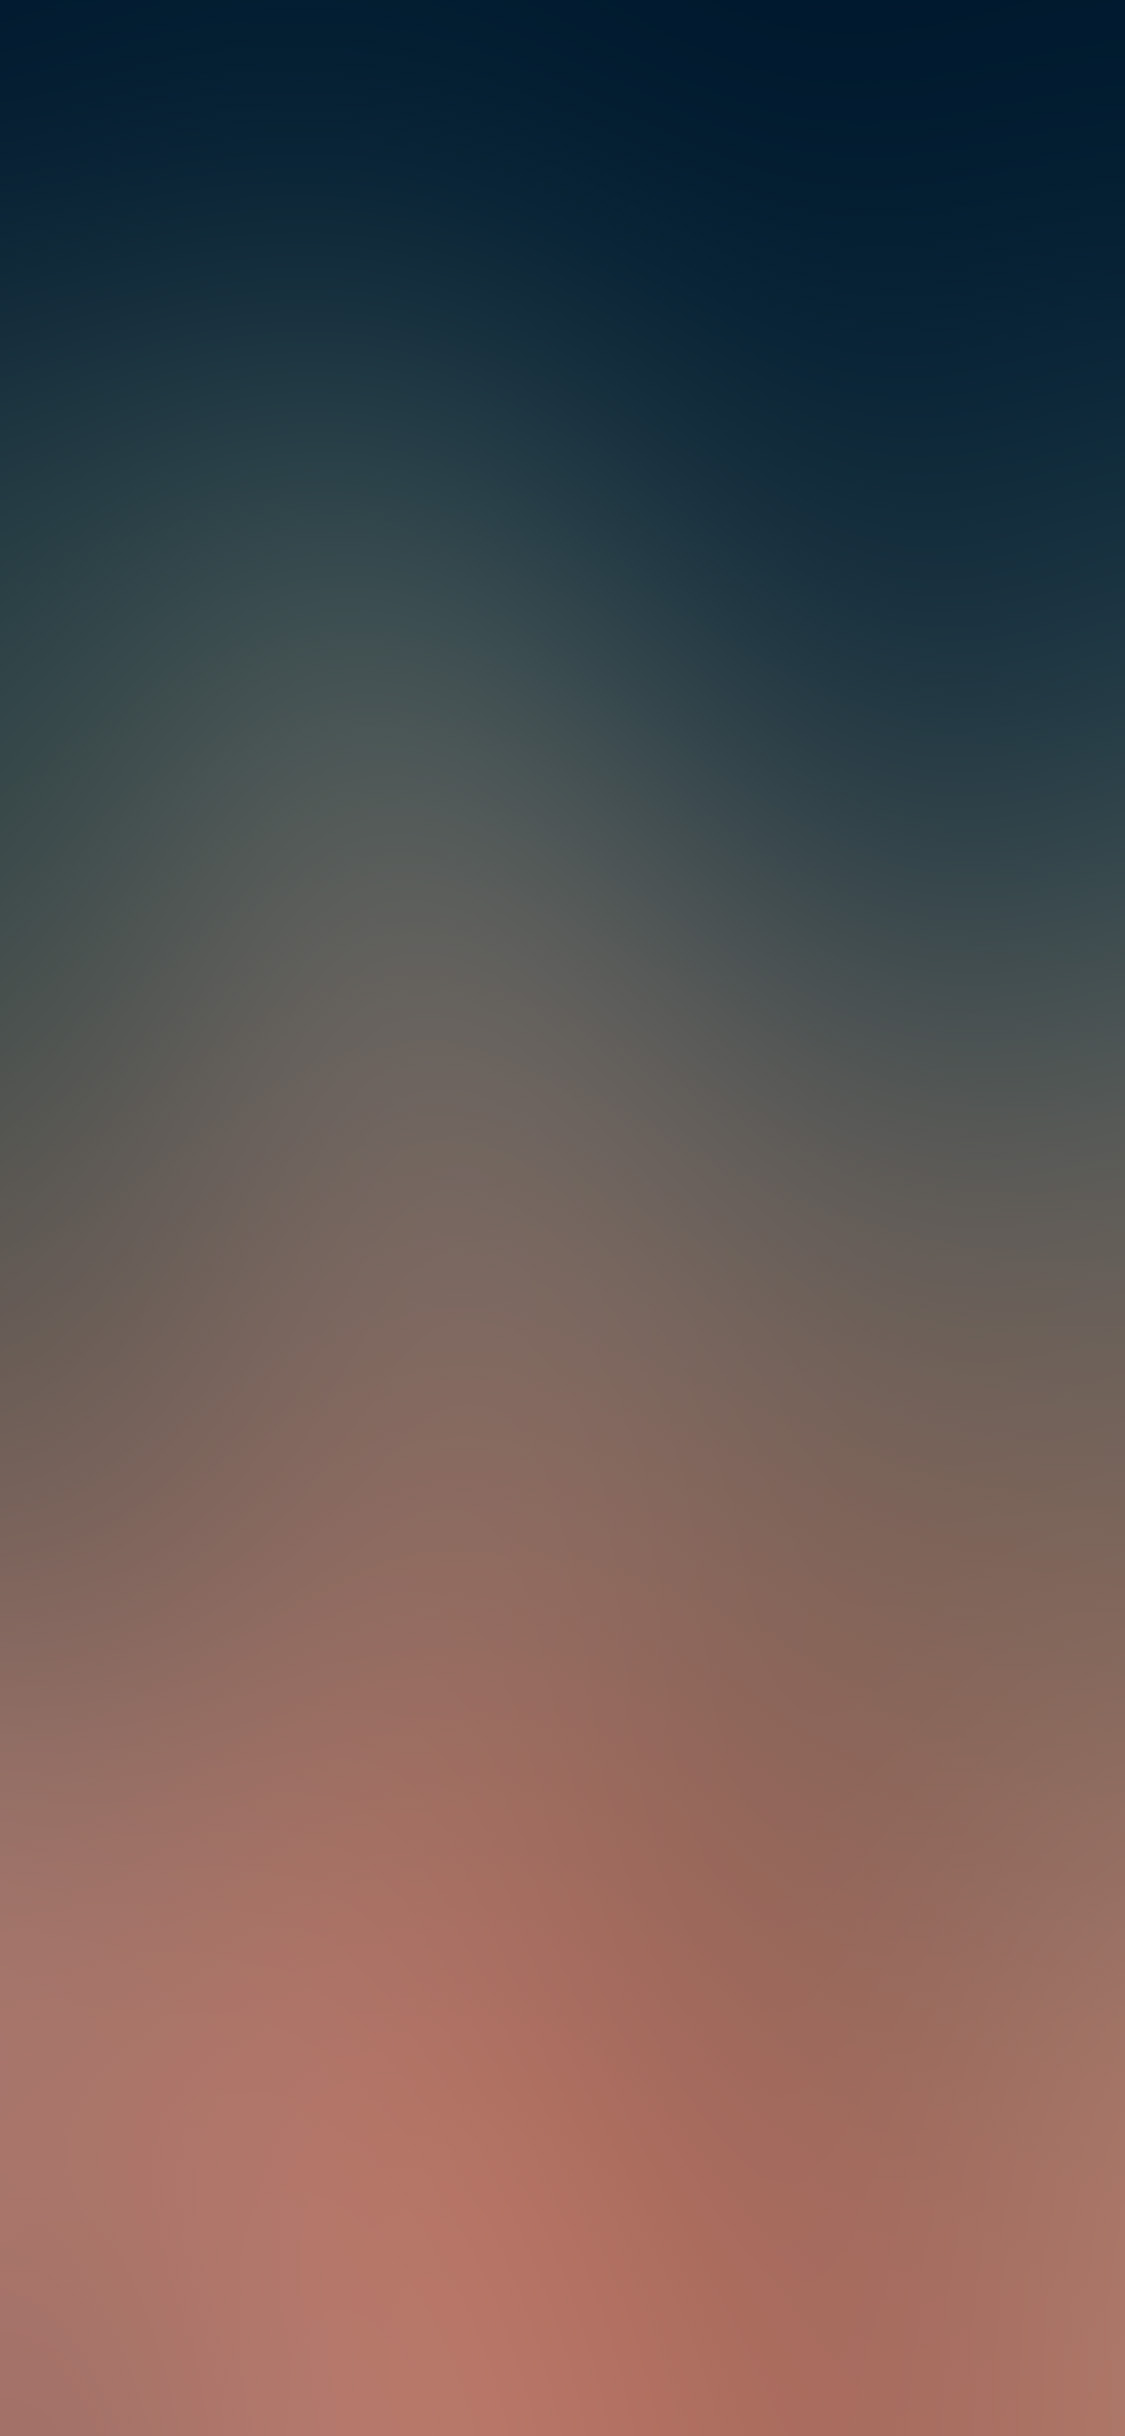 iPhonexpapers.com-Apple-iPhone-wallpaper-sm72-blue-coral-soft-blur-gradation